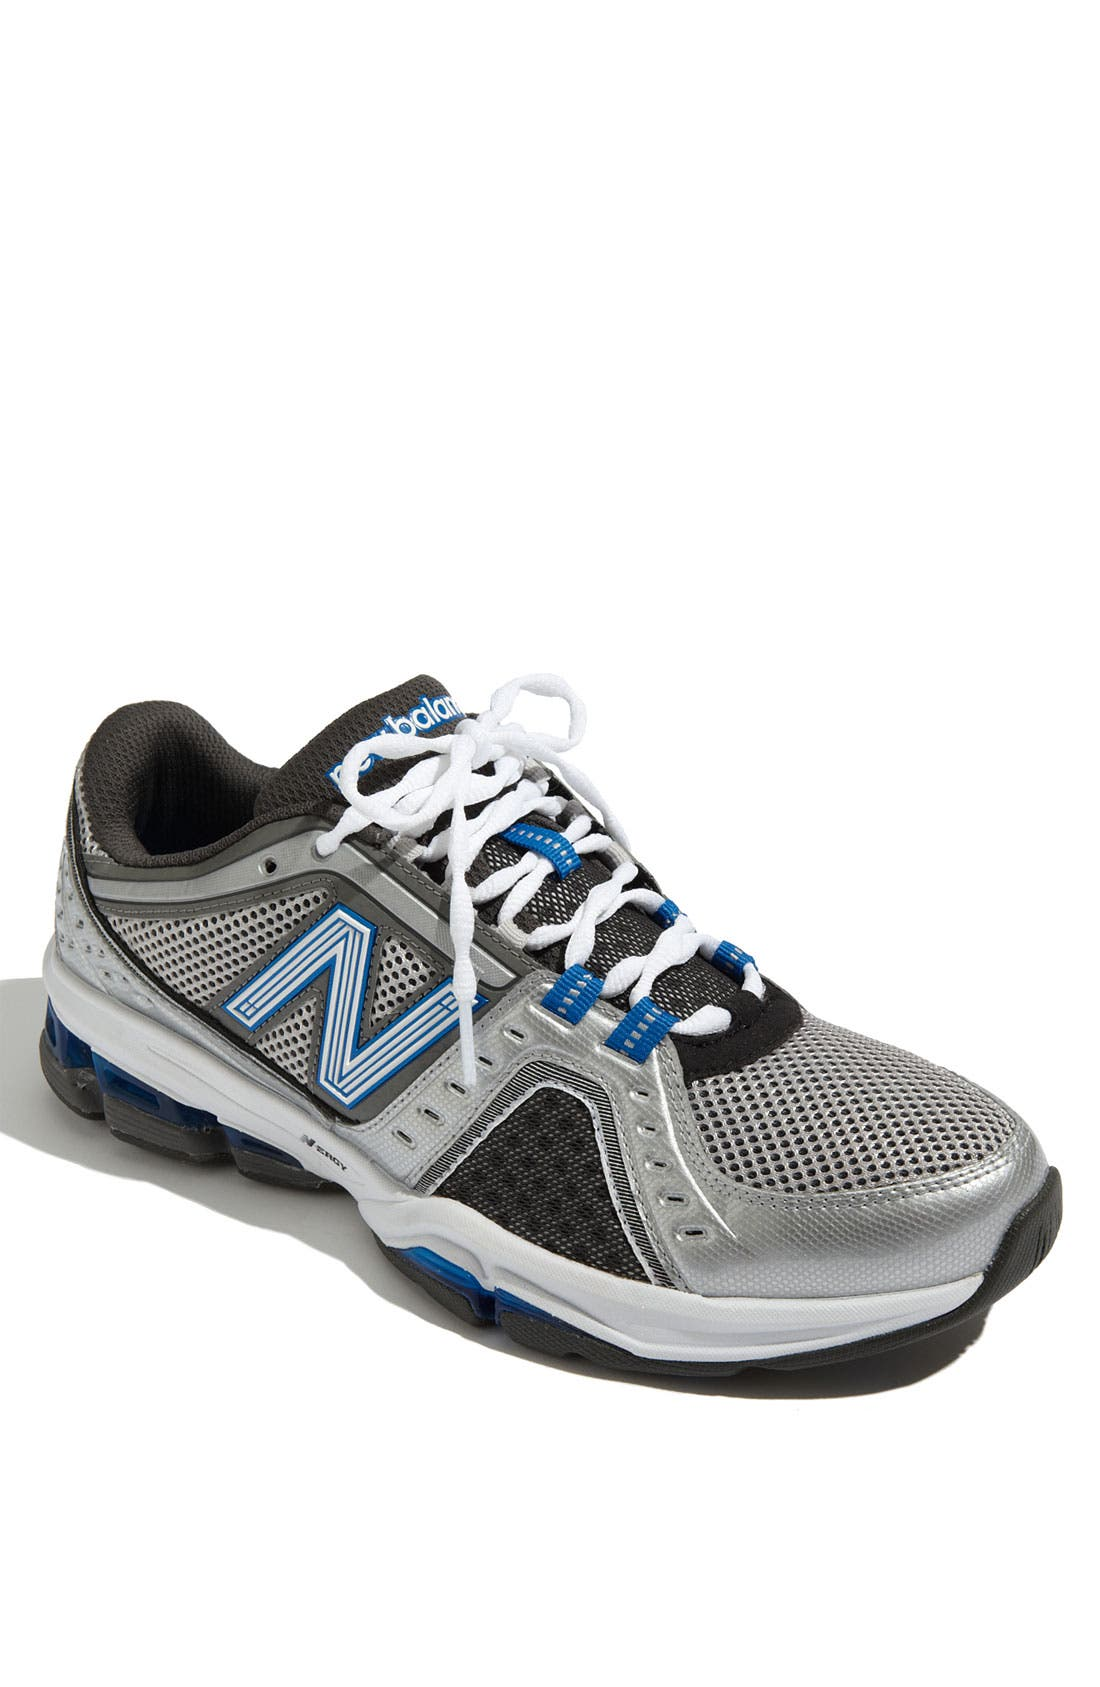 Alternate Image 1 Selected - New Balance '1211' Training Shoe (Men) (Online Only)